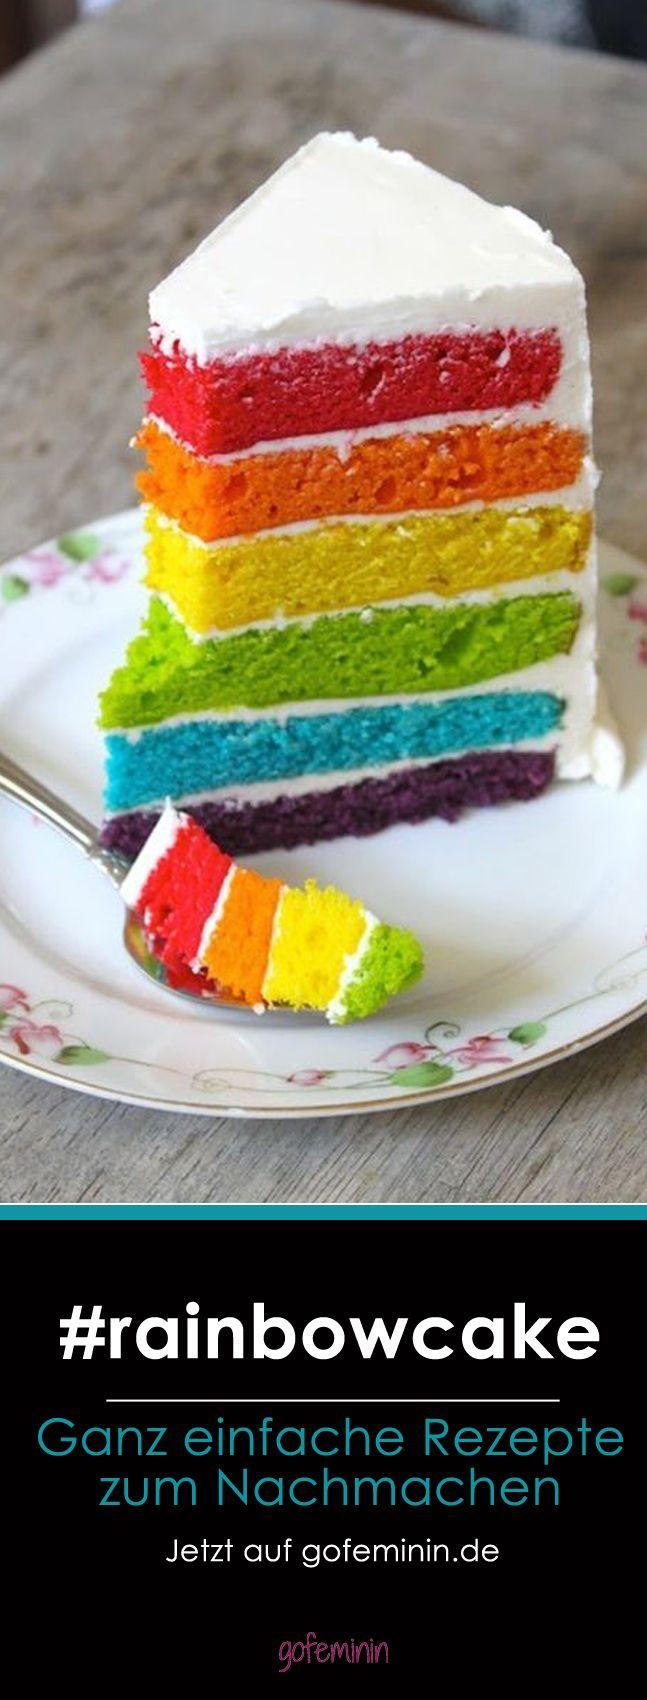 Mjam, mjam Regenbogenkuchen!  Jetzt auf gofeminin.de (Rainbow Cake)